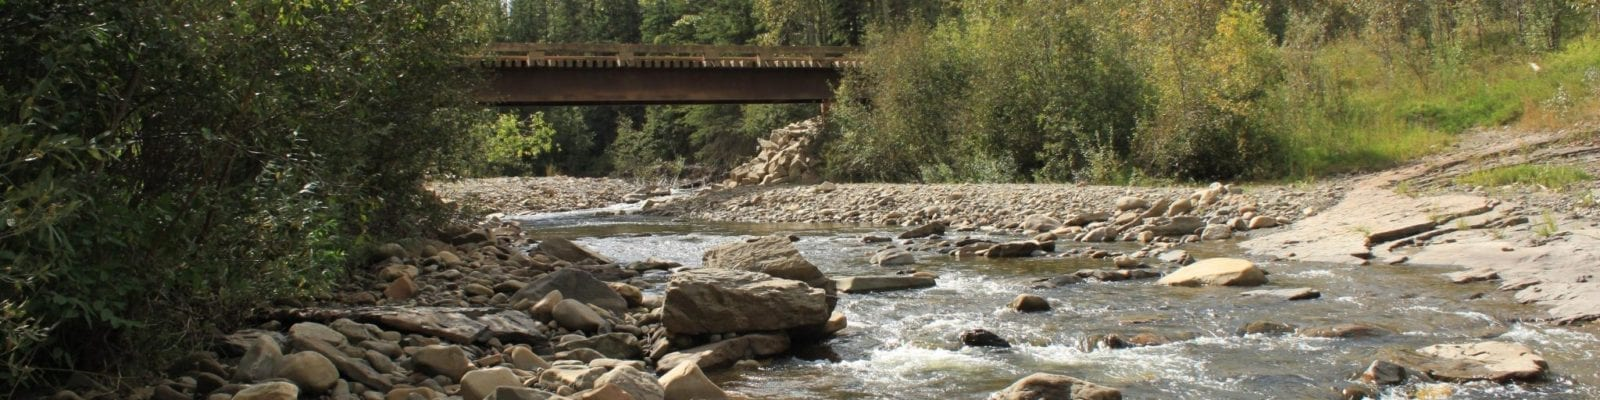 Gething Creek (9)